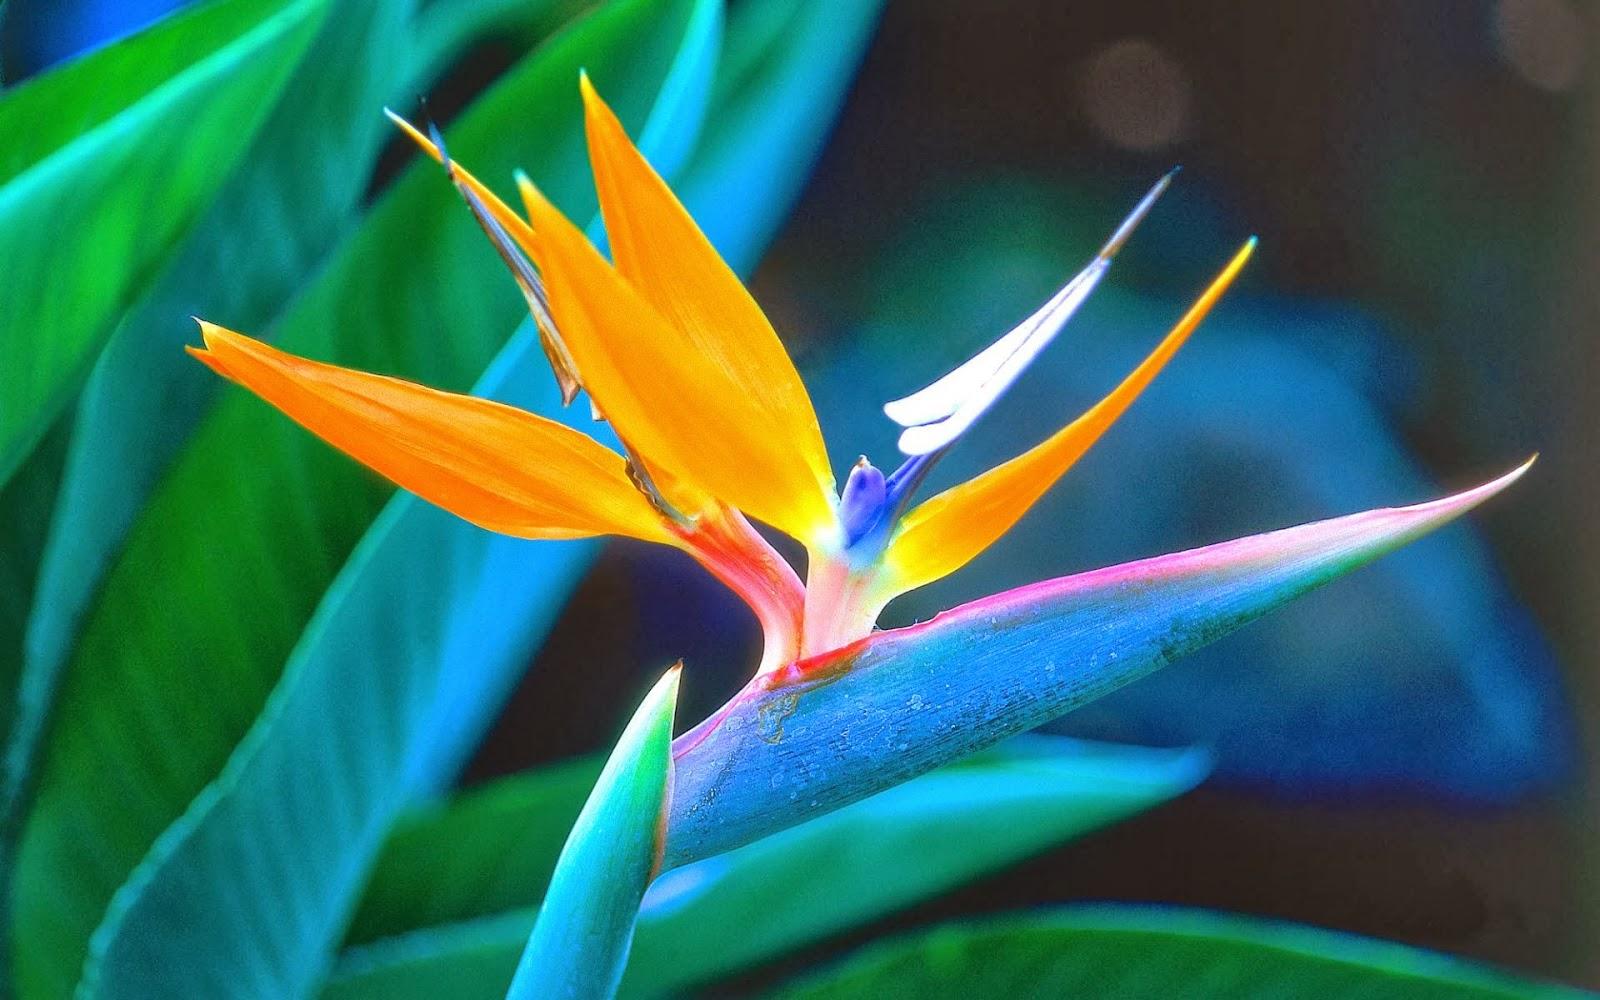 "<img src=""http://2.bp.blogspot.com/-Egsis7L97qg/UtujCBctuTI/AAAAAAAAI7k/LPvTDsSes0I/s1600/bird-of-paradise.jpg"" alt=""bird of paradise"" />"